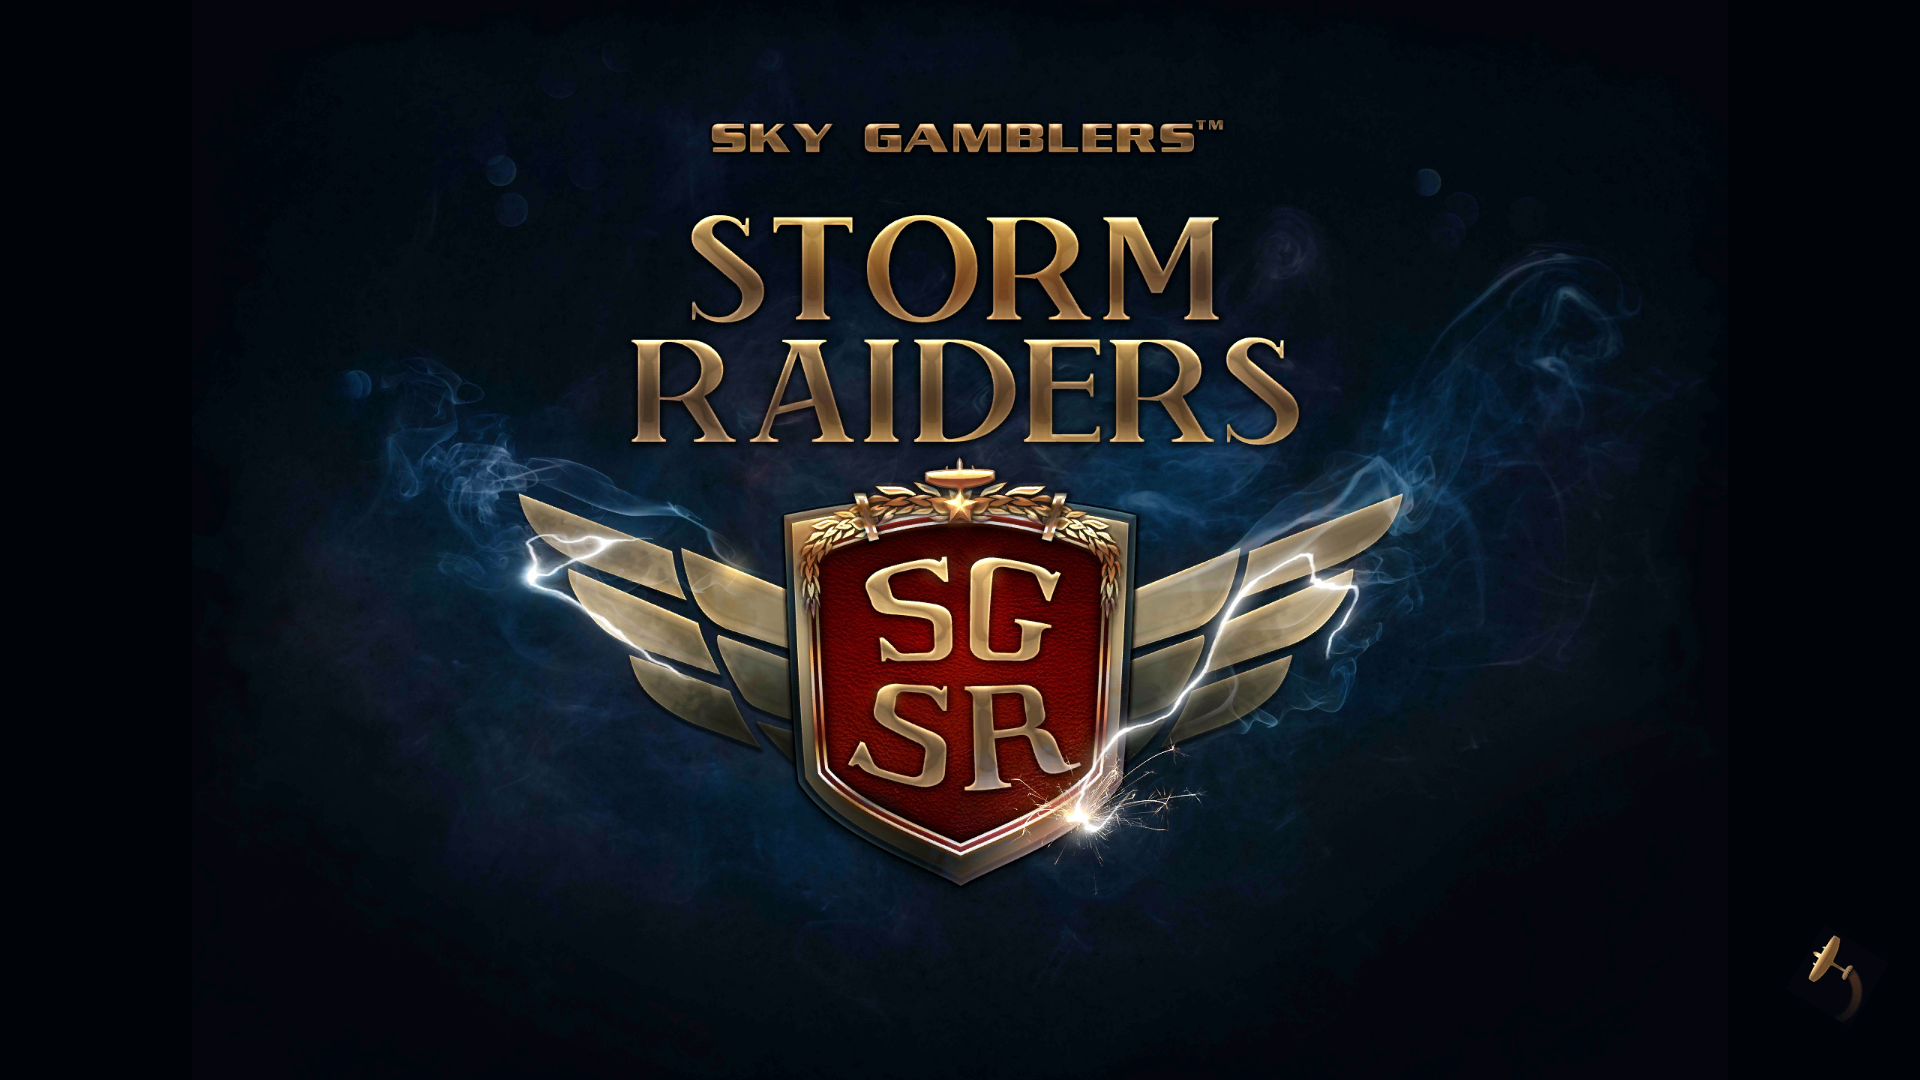 Sky Gamblers Storm Raiders-1